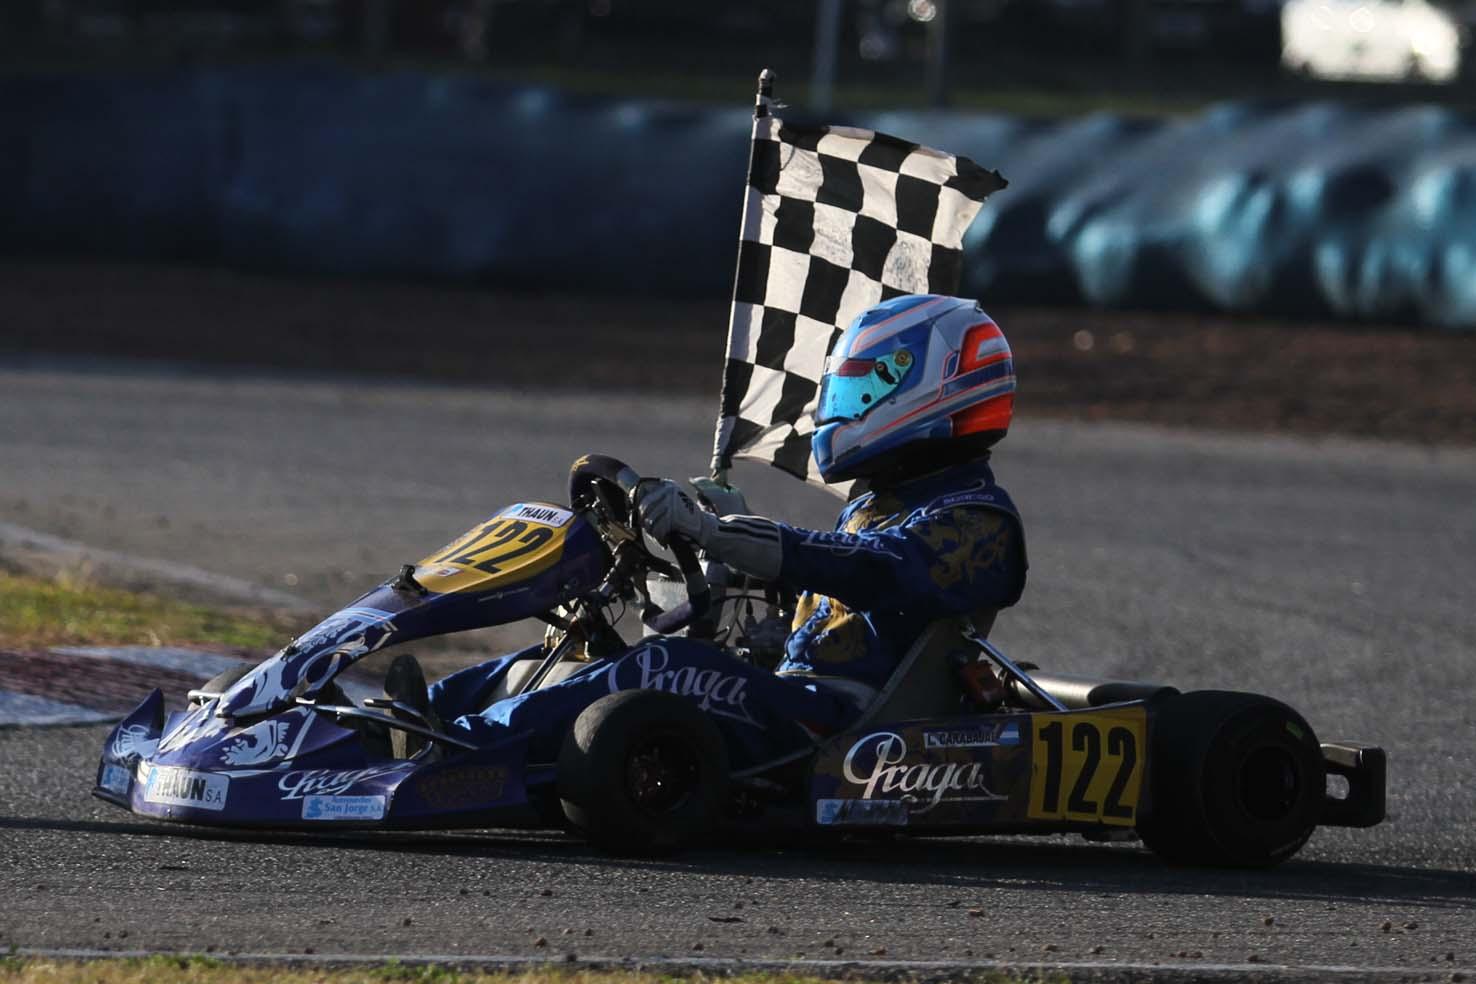 Praga Argentina won in 3 categories , PRE-SUDAMERICANO ROTAX :